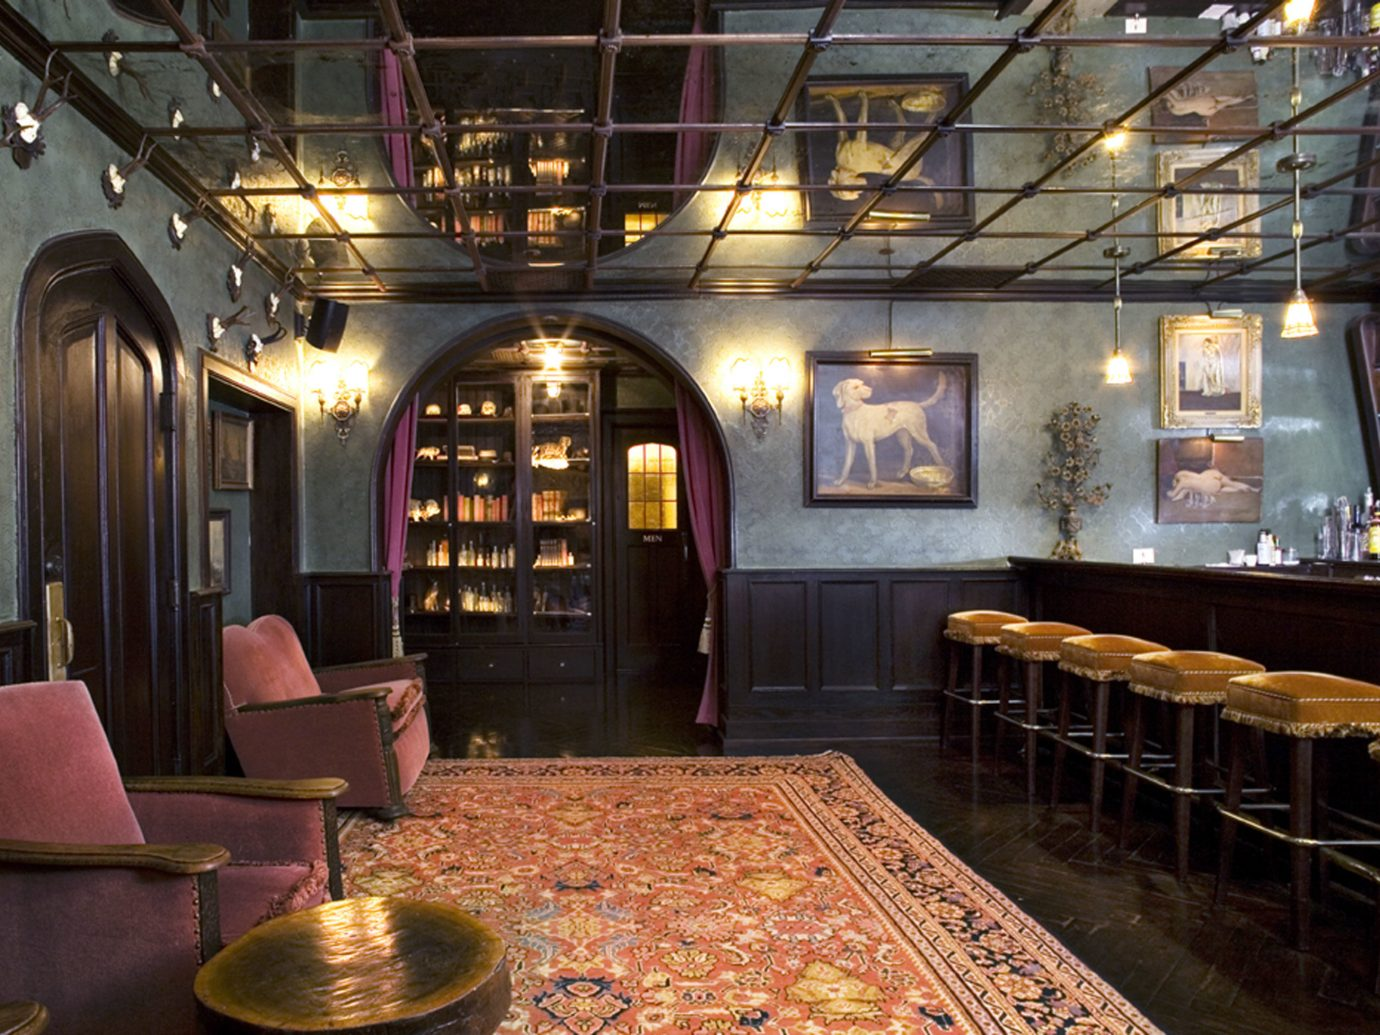 Offbeat indoor floor ceiling Lobby restaurant interior design Bar estate area several dining room